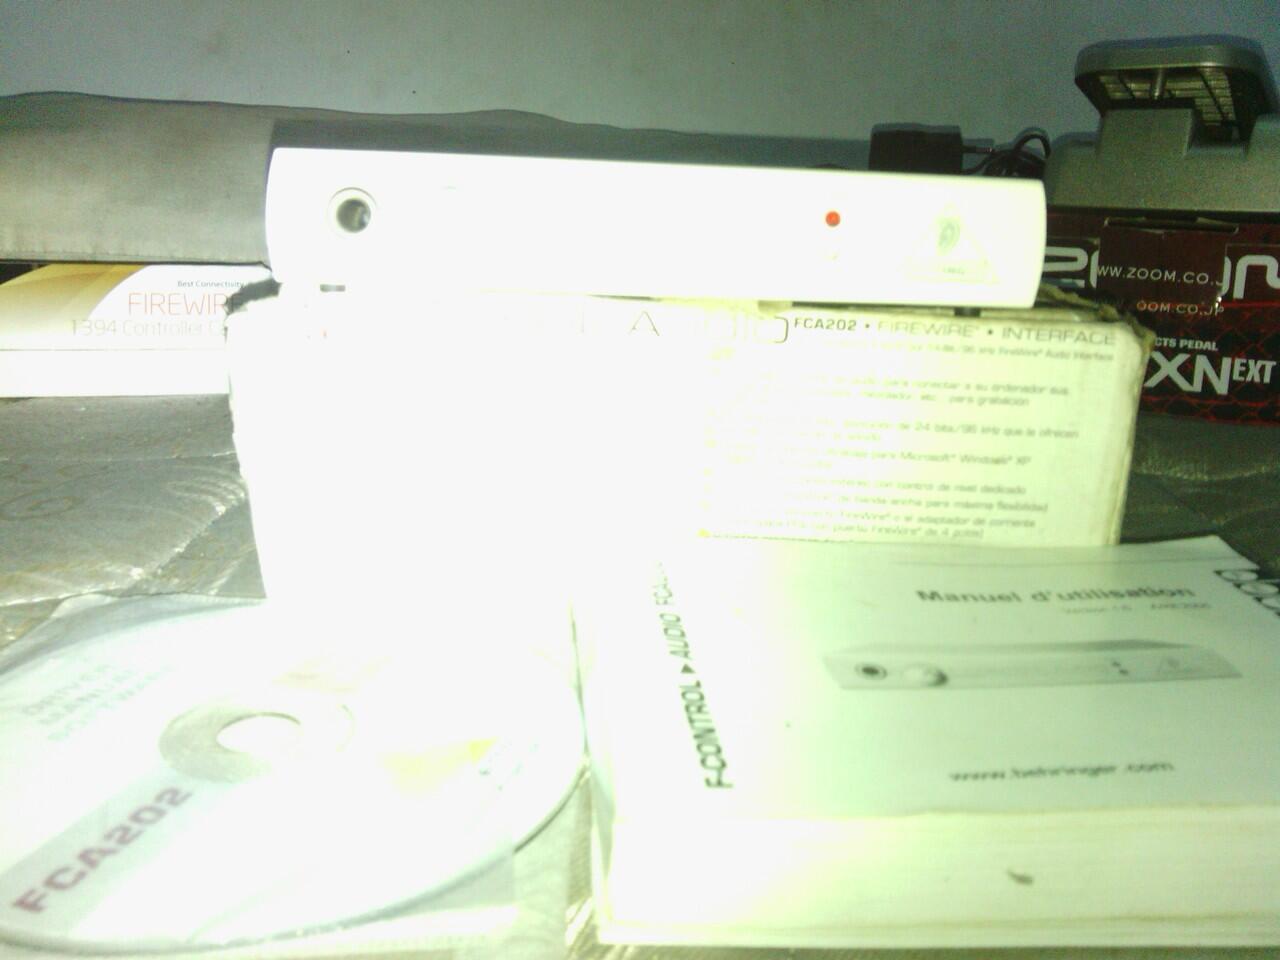 Soundcard FireWire BEHRINGER FCA202 [apa adanya]